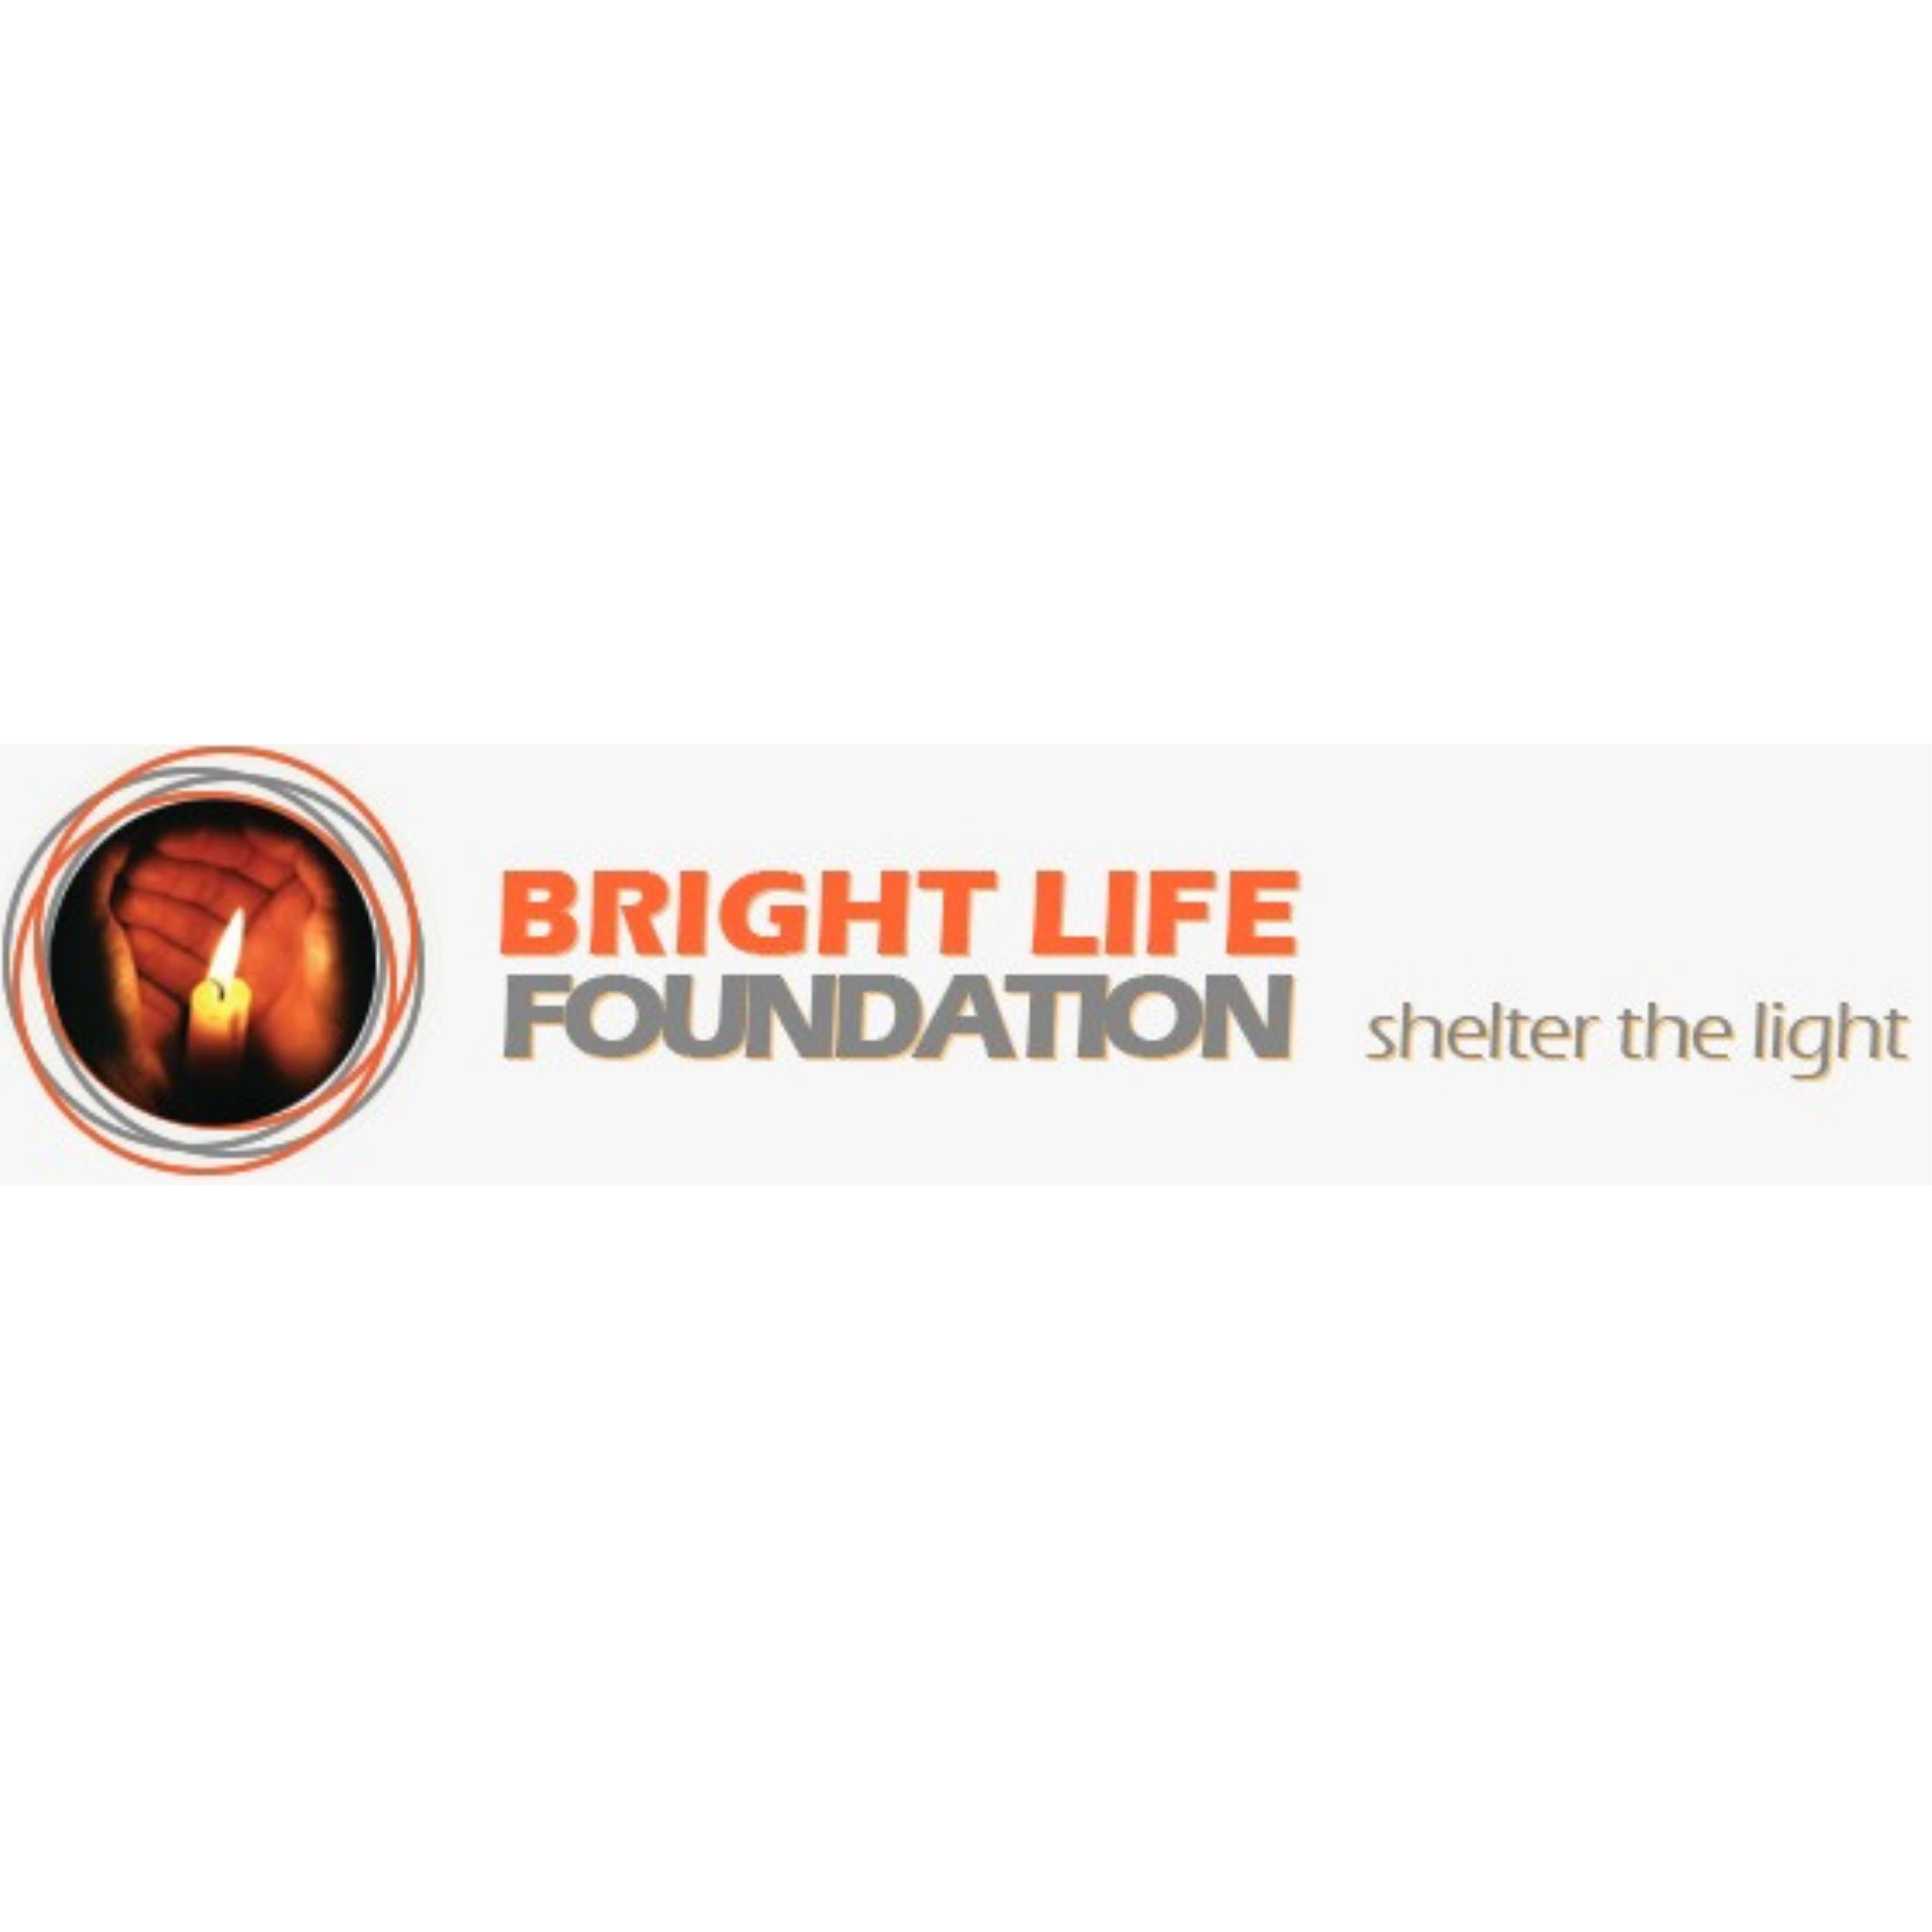 Bright Life Foundation